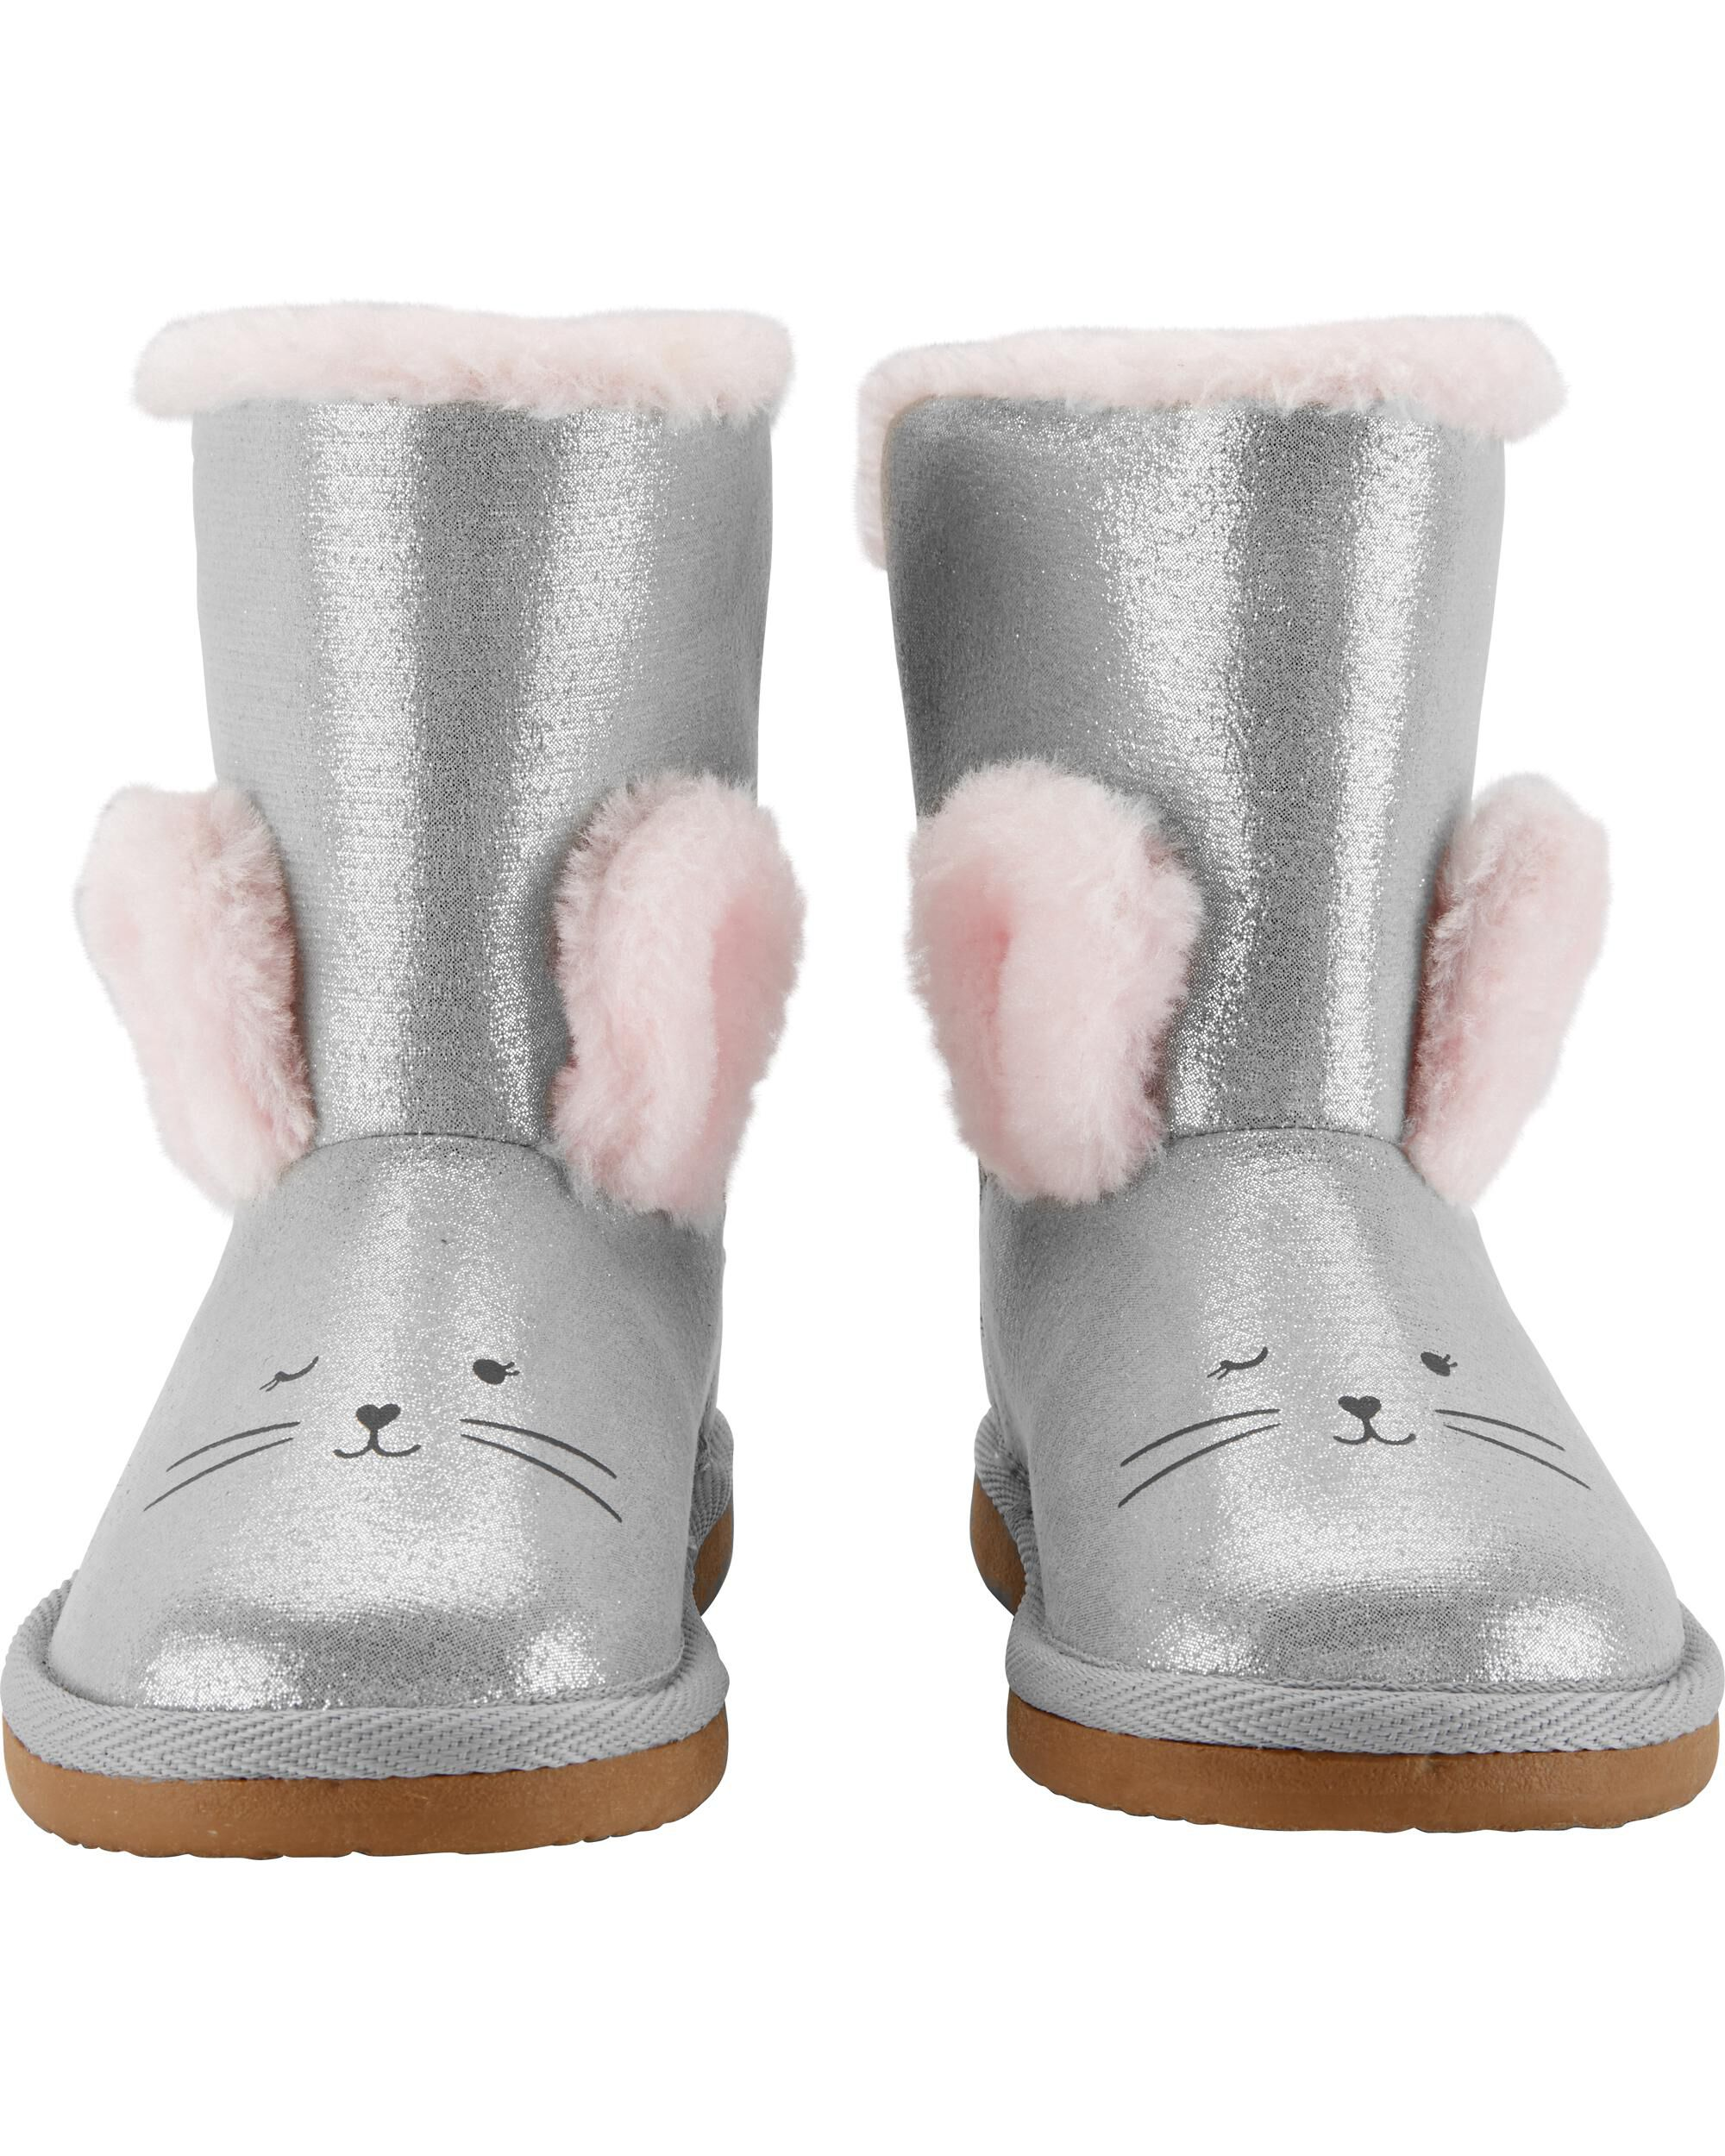 Carter's Bunny Boots   carters.com